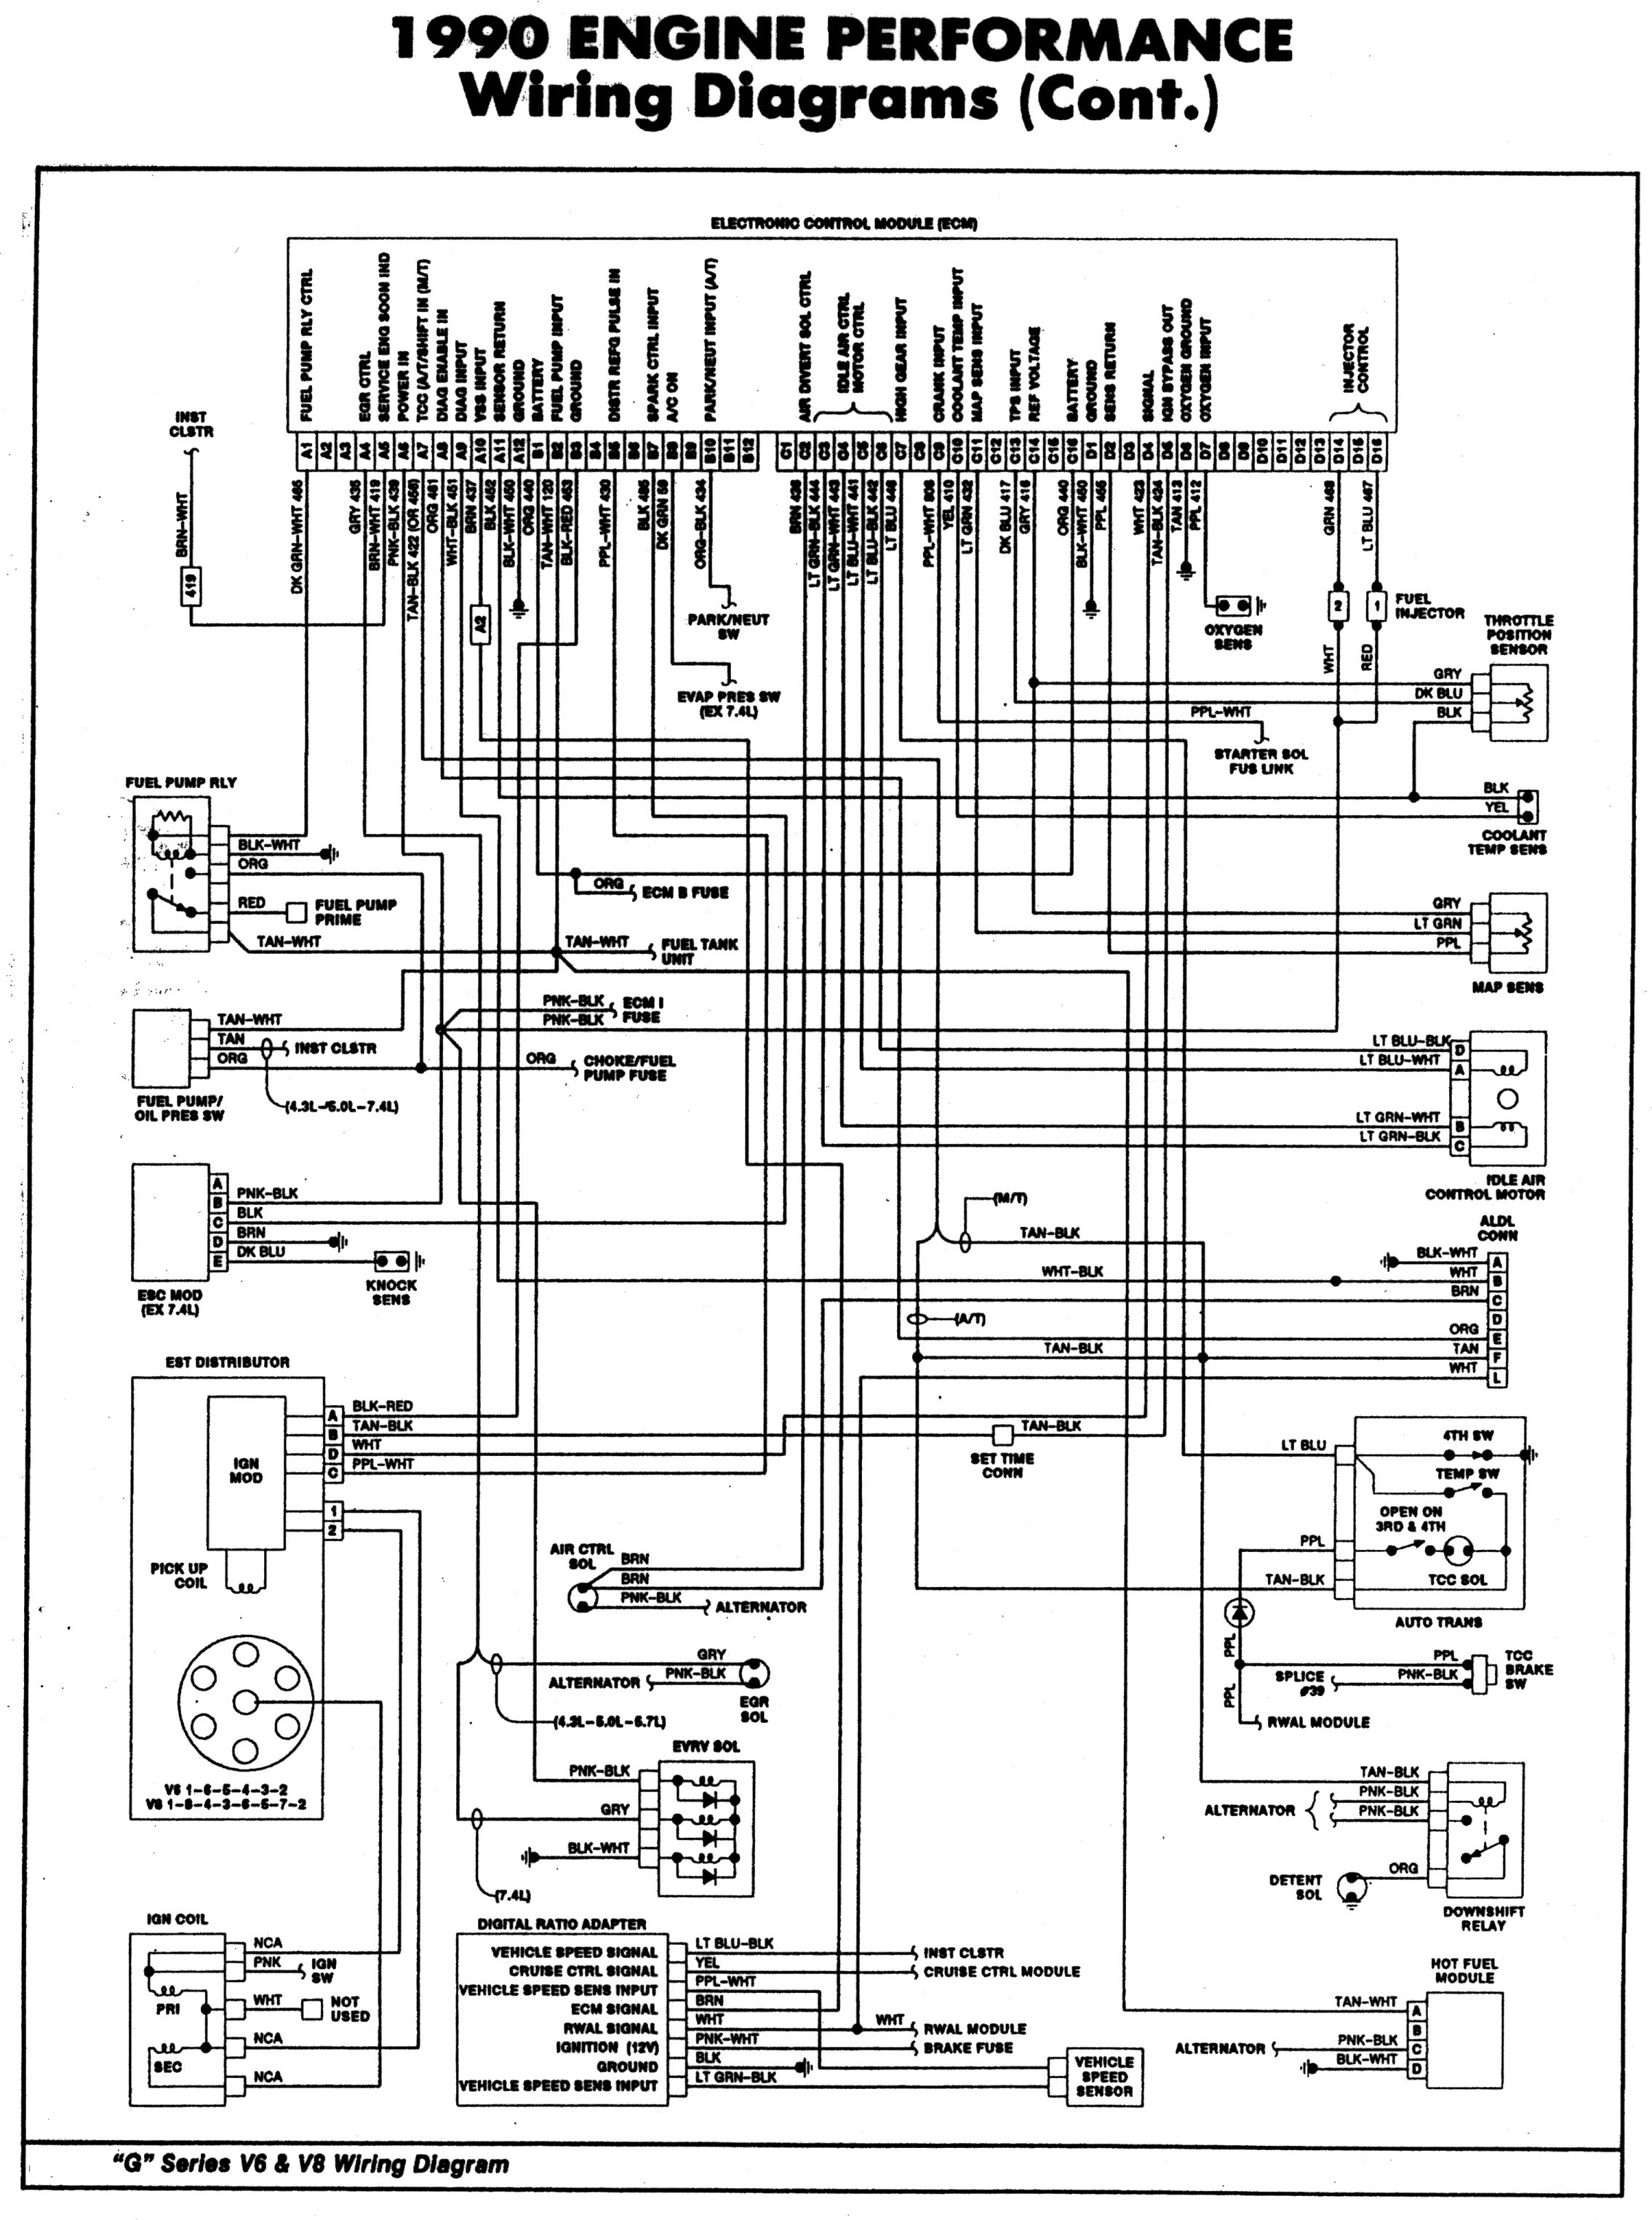 Dodge Ram 1500 Engine Diagram Wiring Diagram 2007 Dodge Ram 1500 Copy 2002 for Coachedby Of Dodge Ram 1500 Engine Diagram